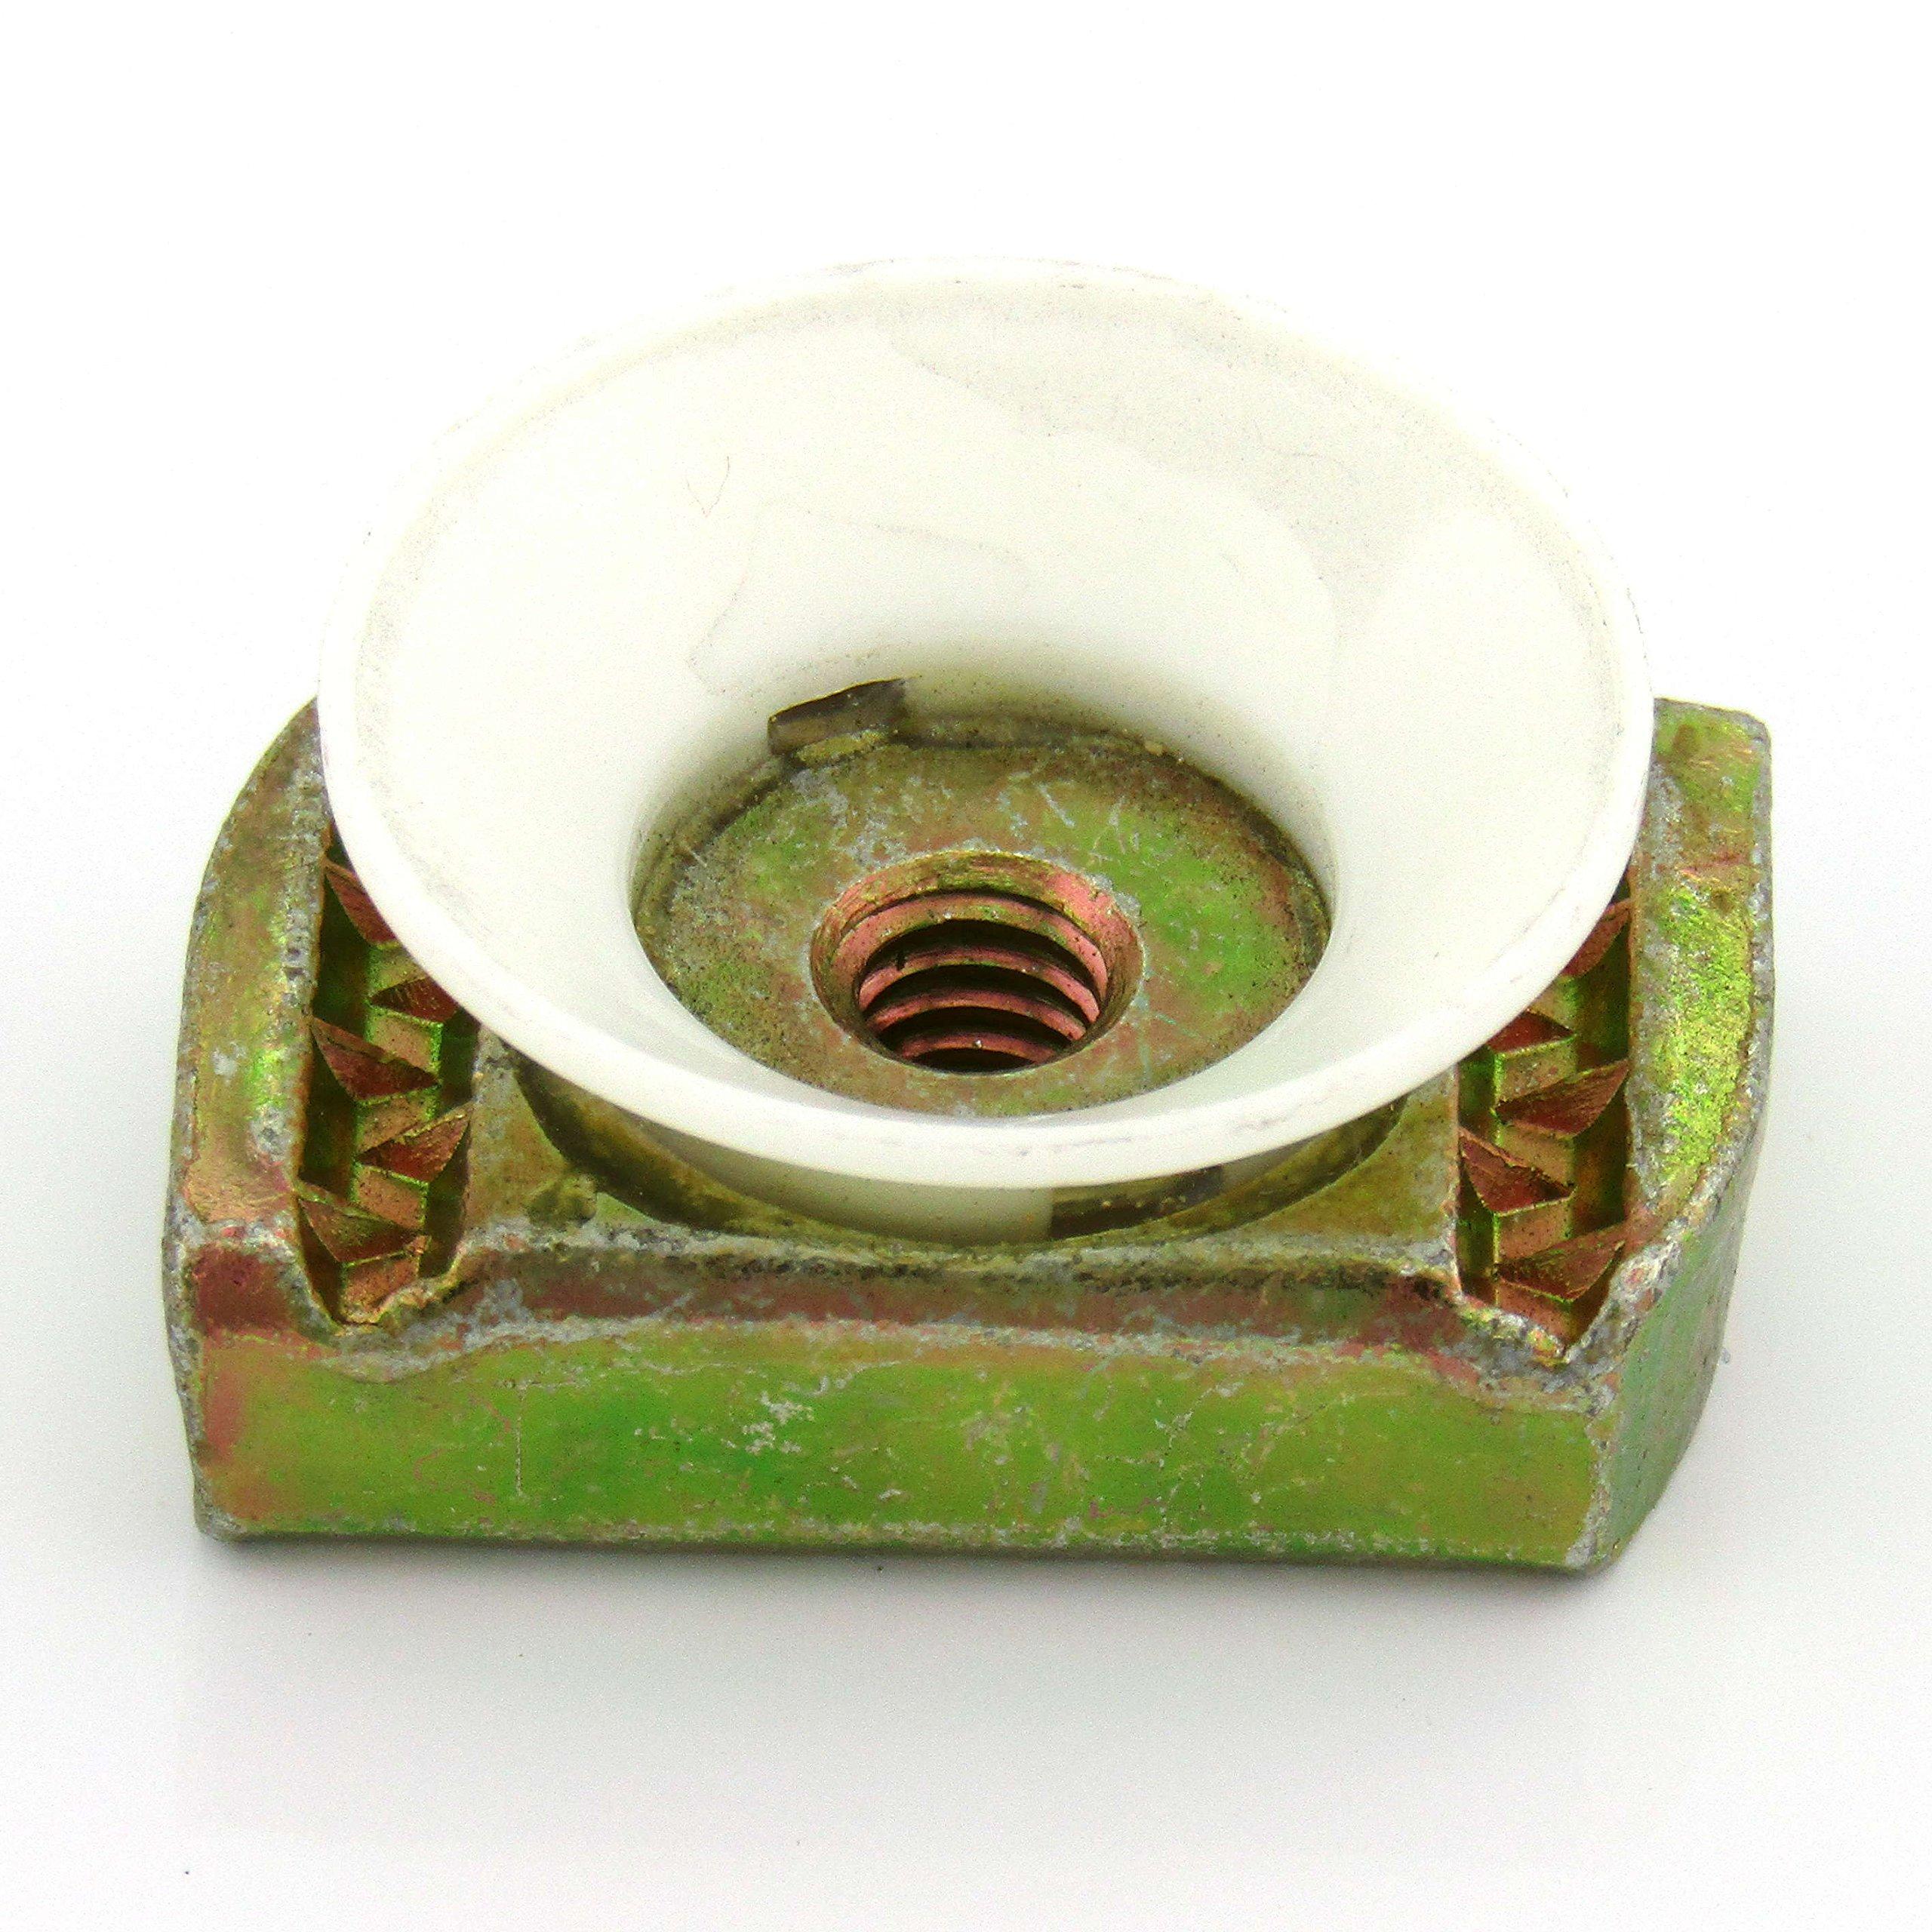 1/4-20 Nylon Cone L/N; Yellow Zinc (100 per box)